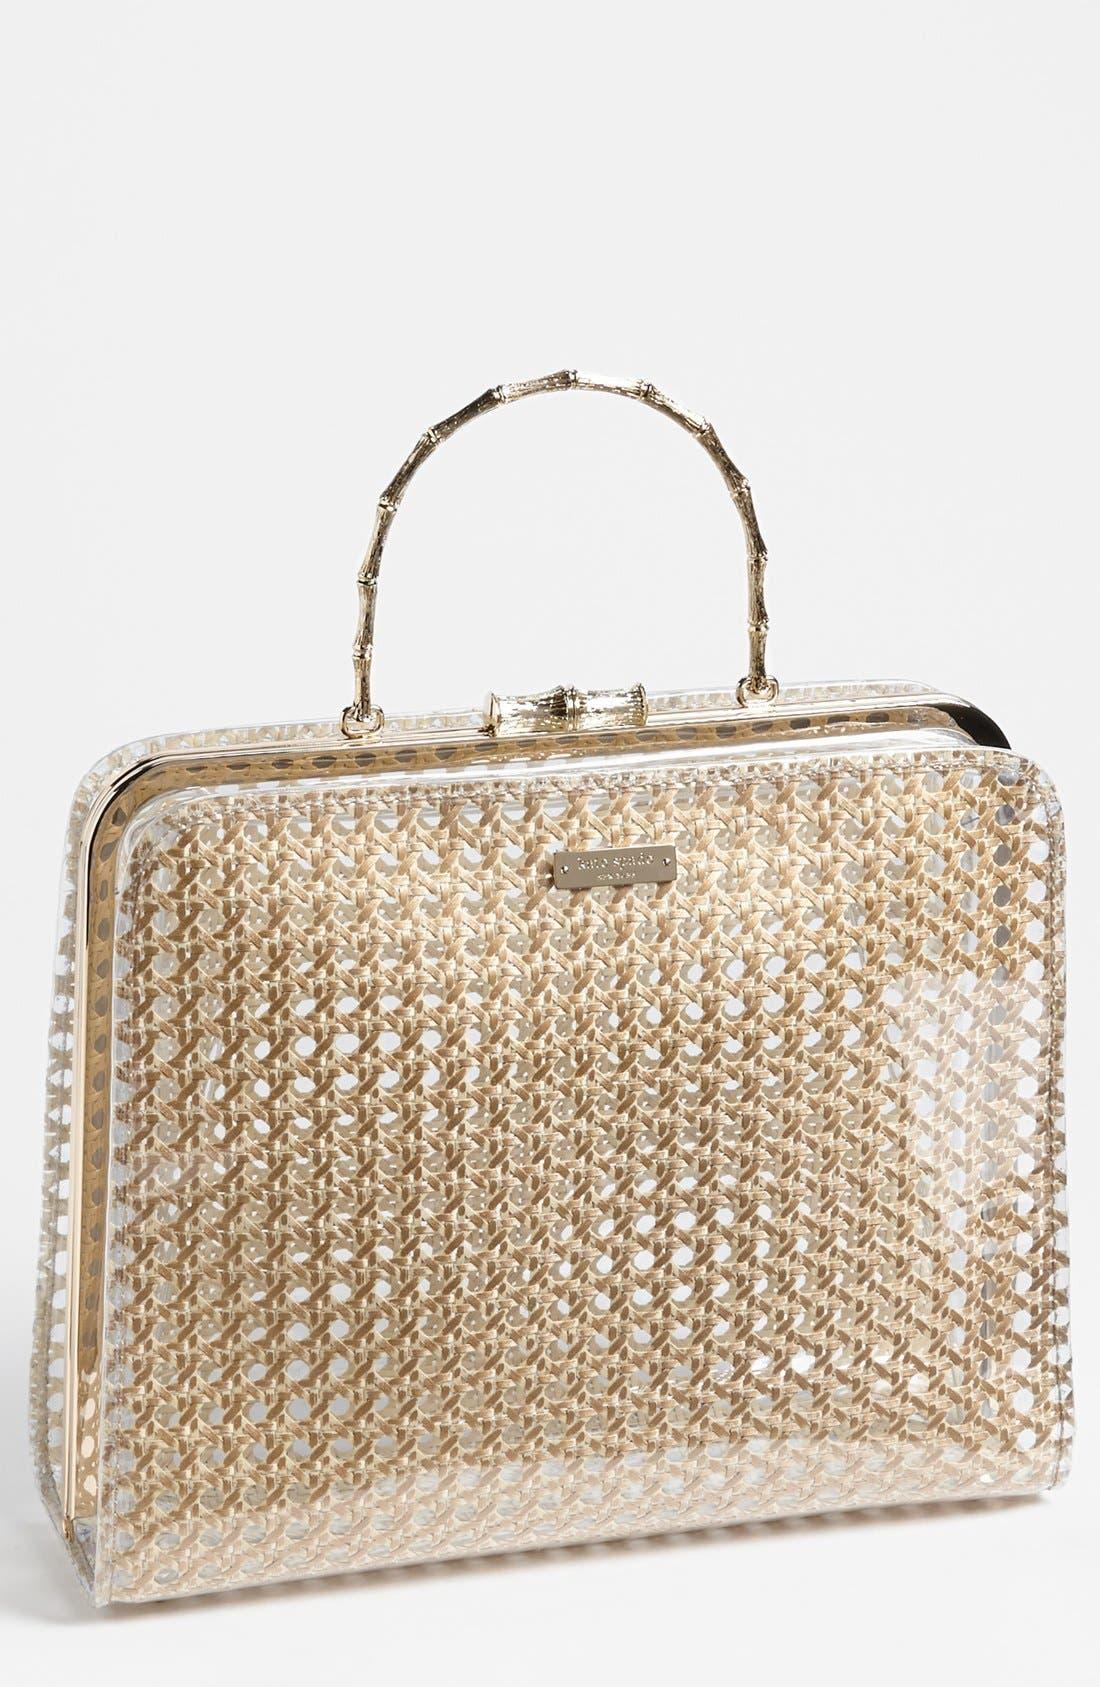 Main Image - kate spade new york 'summer house - sylvia' handbag